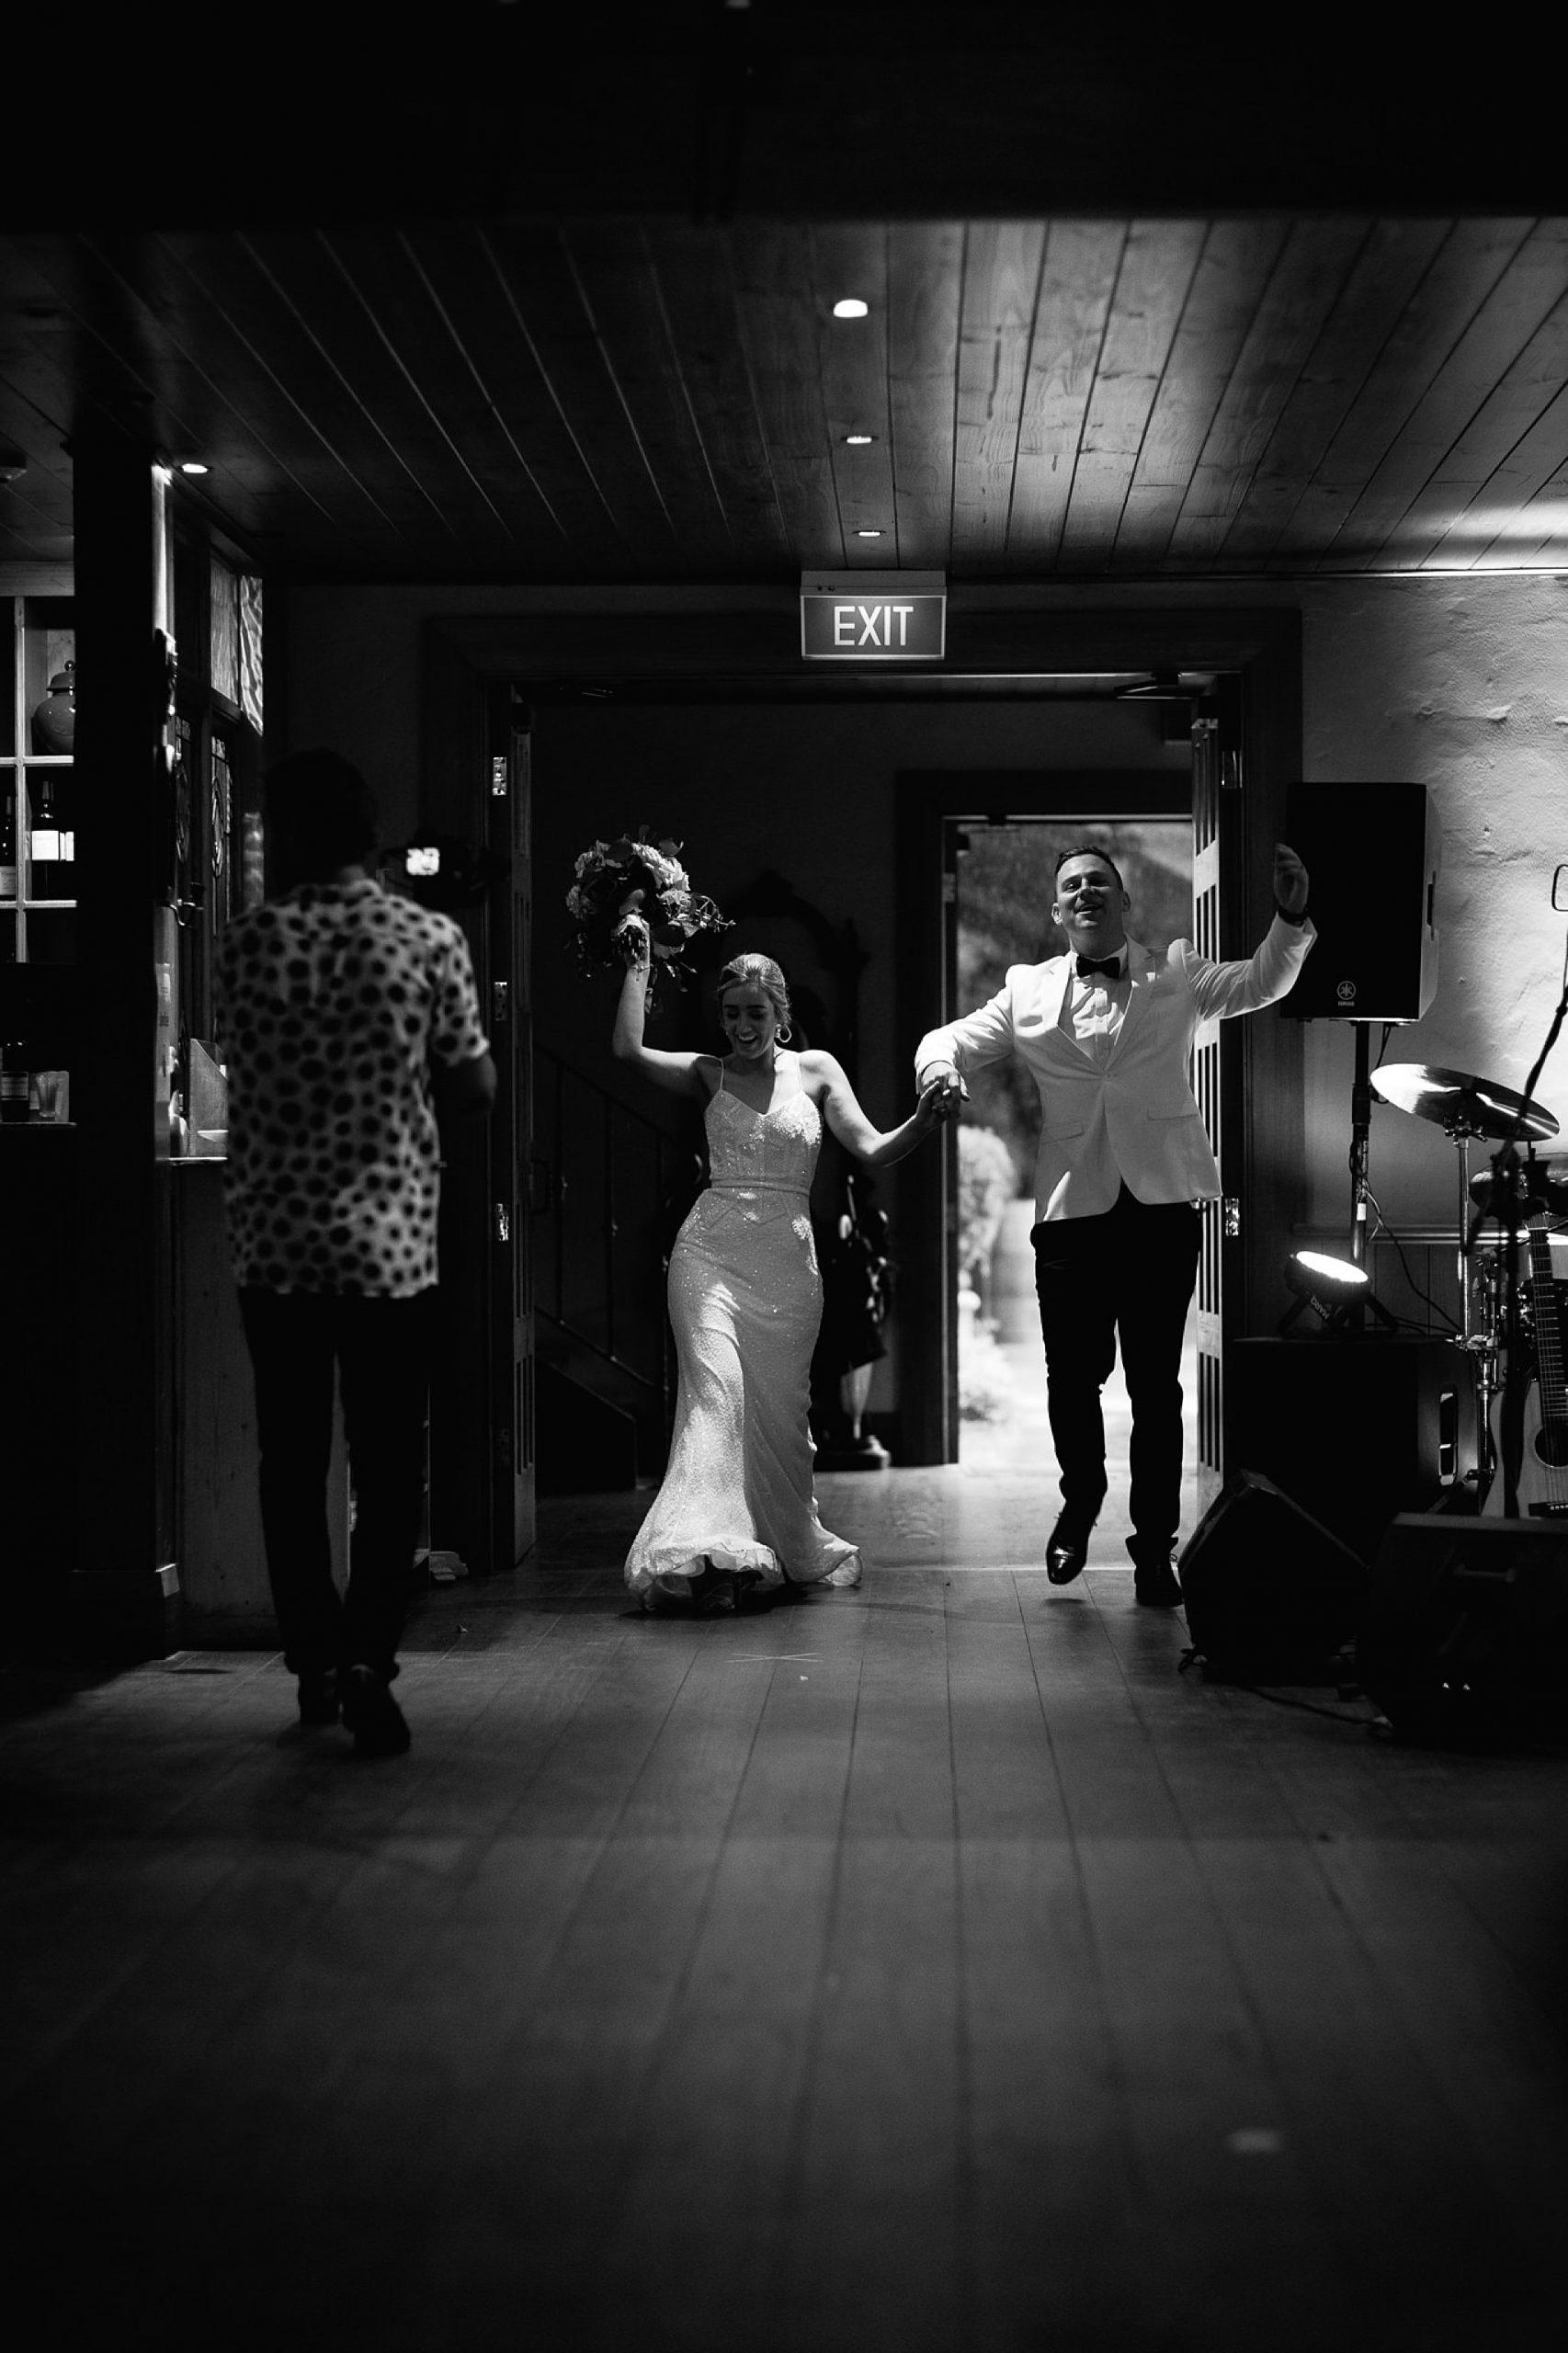 Keepsakephoto by the Keeffes,ACT wedding photographer,ACT weddings,Bowral,Bowral Wedding Photographer,canberra wedding,Canberra Wedding Photographer,Canberra Wedding Photography,canberra weddings,destination wedding,Centennial Vineyards,Southern Highlands,Southern Highlands Wedding,